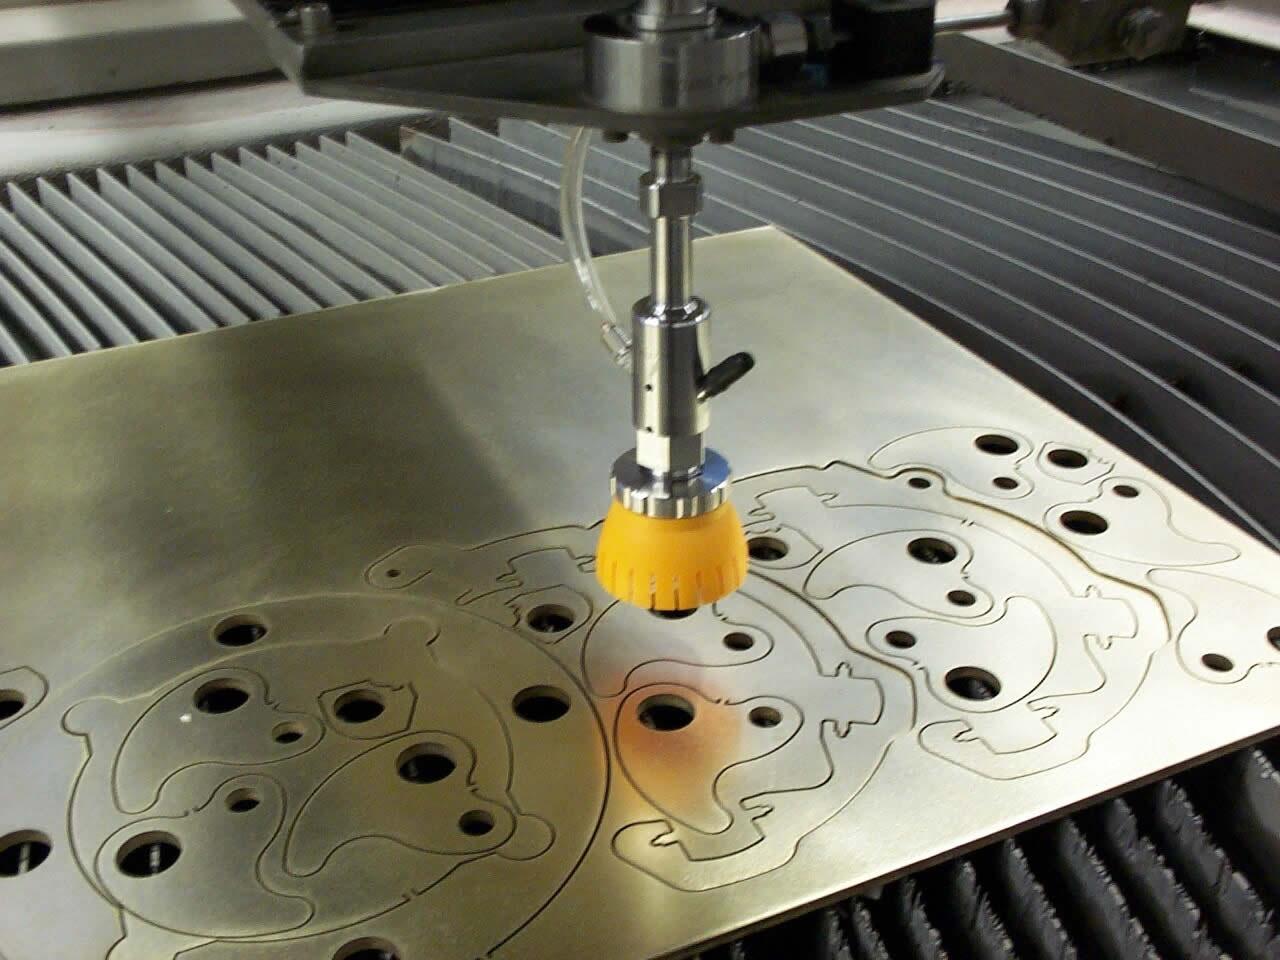 Capital Fabrication - FLOW Dynamic Waterjet Cutting, CNC Milling